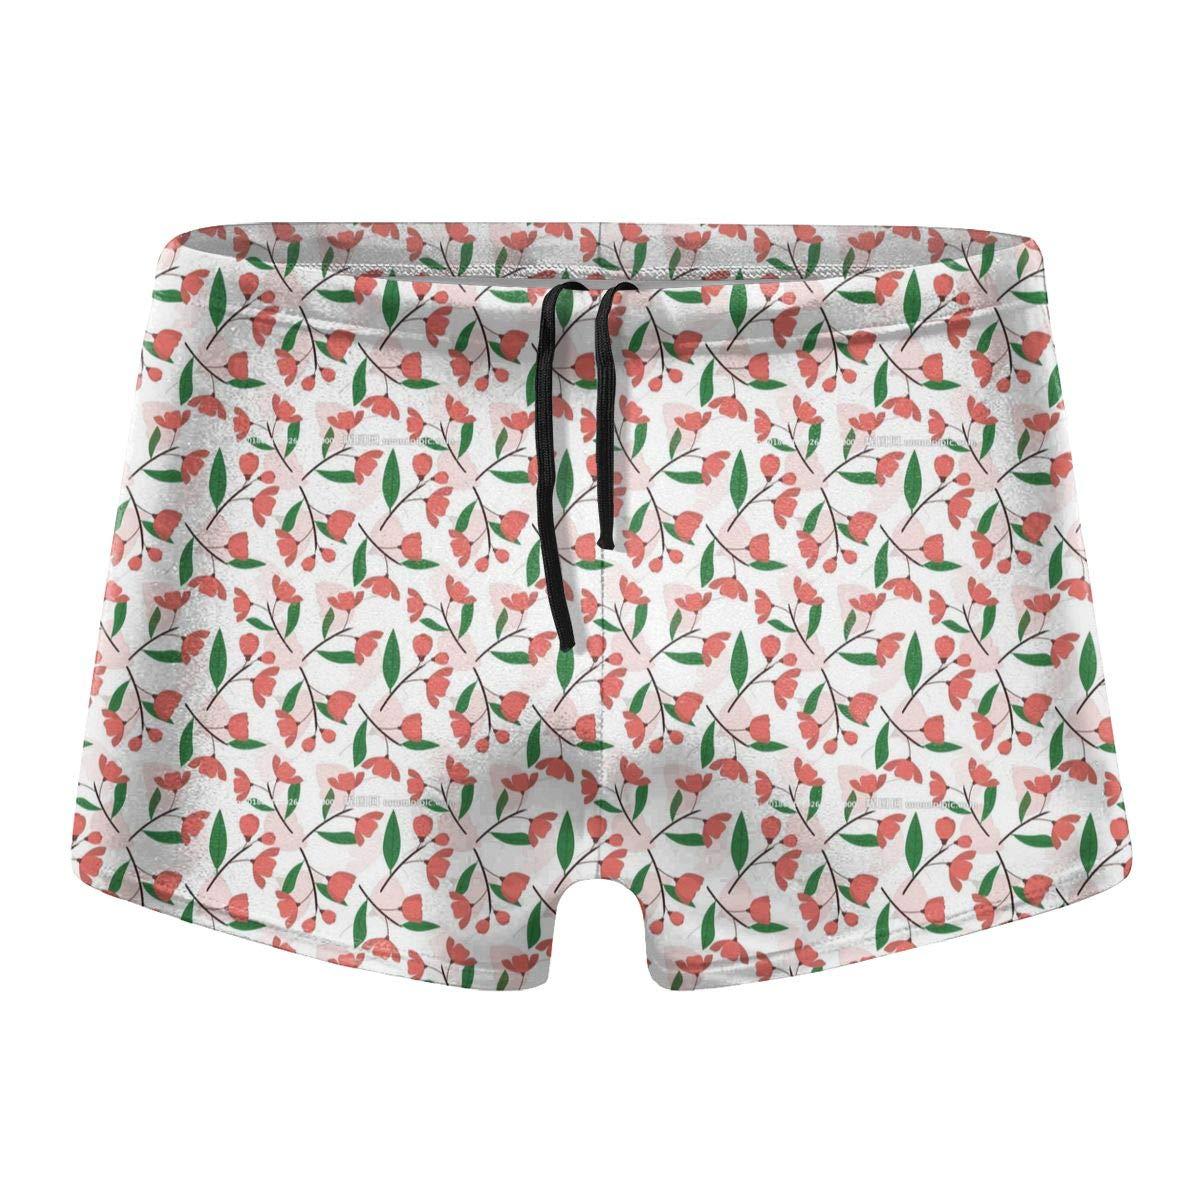 G66TCX Mens Swim Trunks Board Shorts New Sailor Boxer Swimsuit Swim Underwear